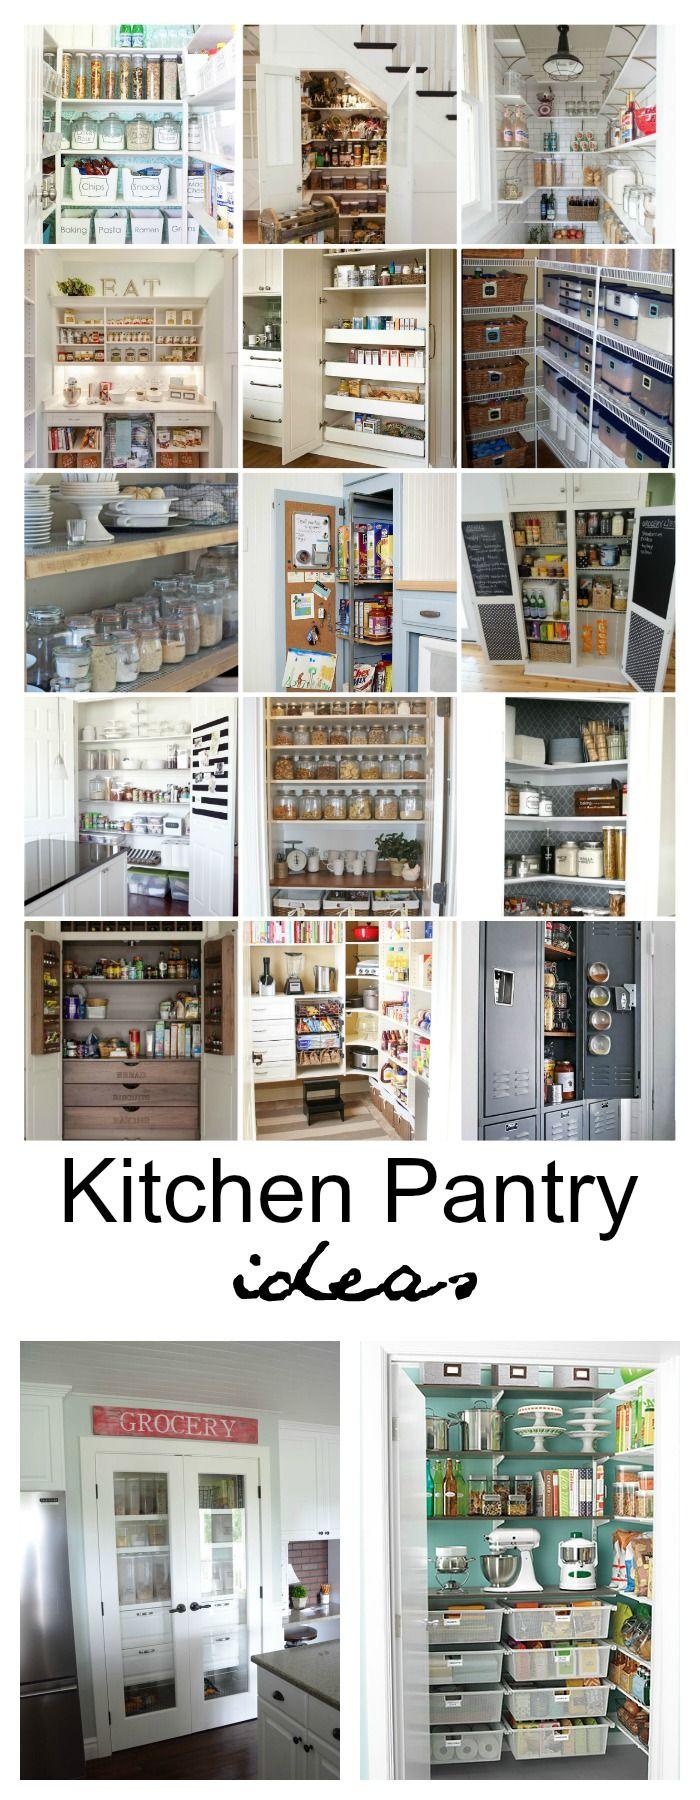 Organized Kitchen Pantry Ideas | Kitchen Makeover | Pinterest ...